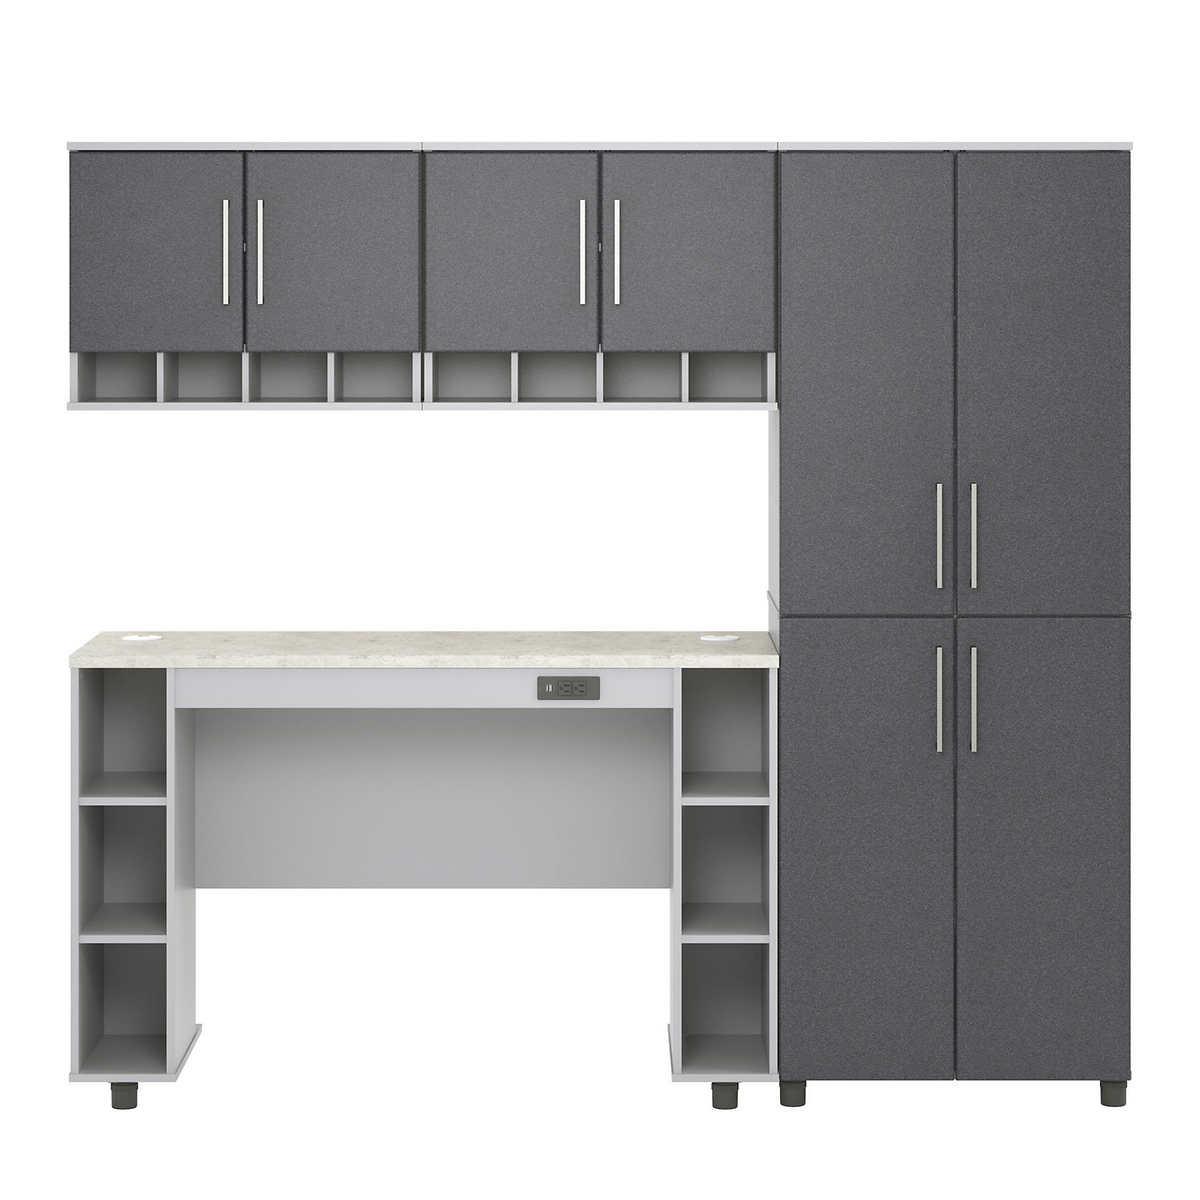 cabinet kitchen buying reports cabinets best hero cro guide bg consumer cr latitude